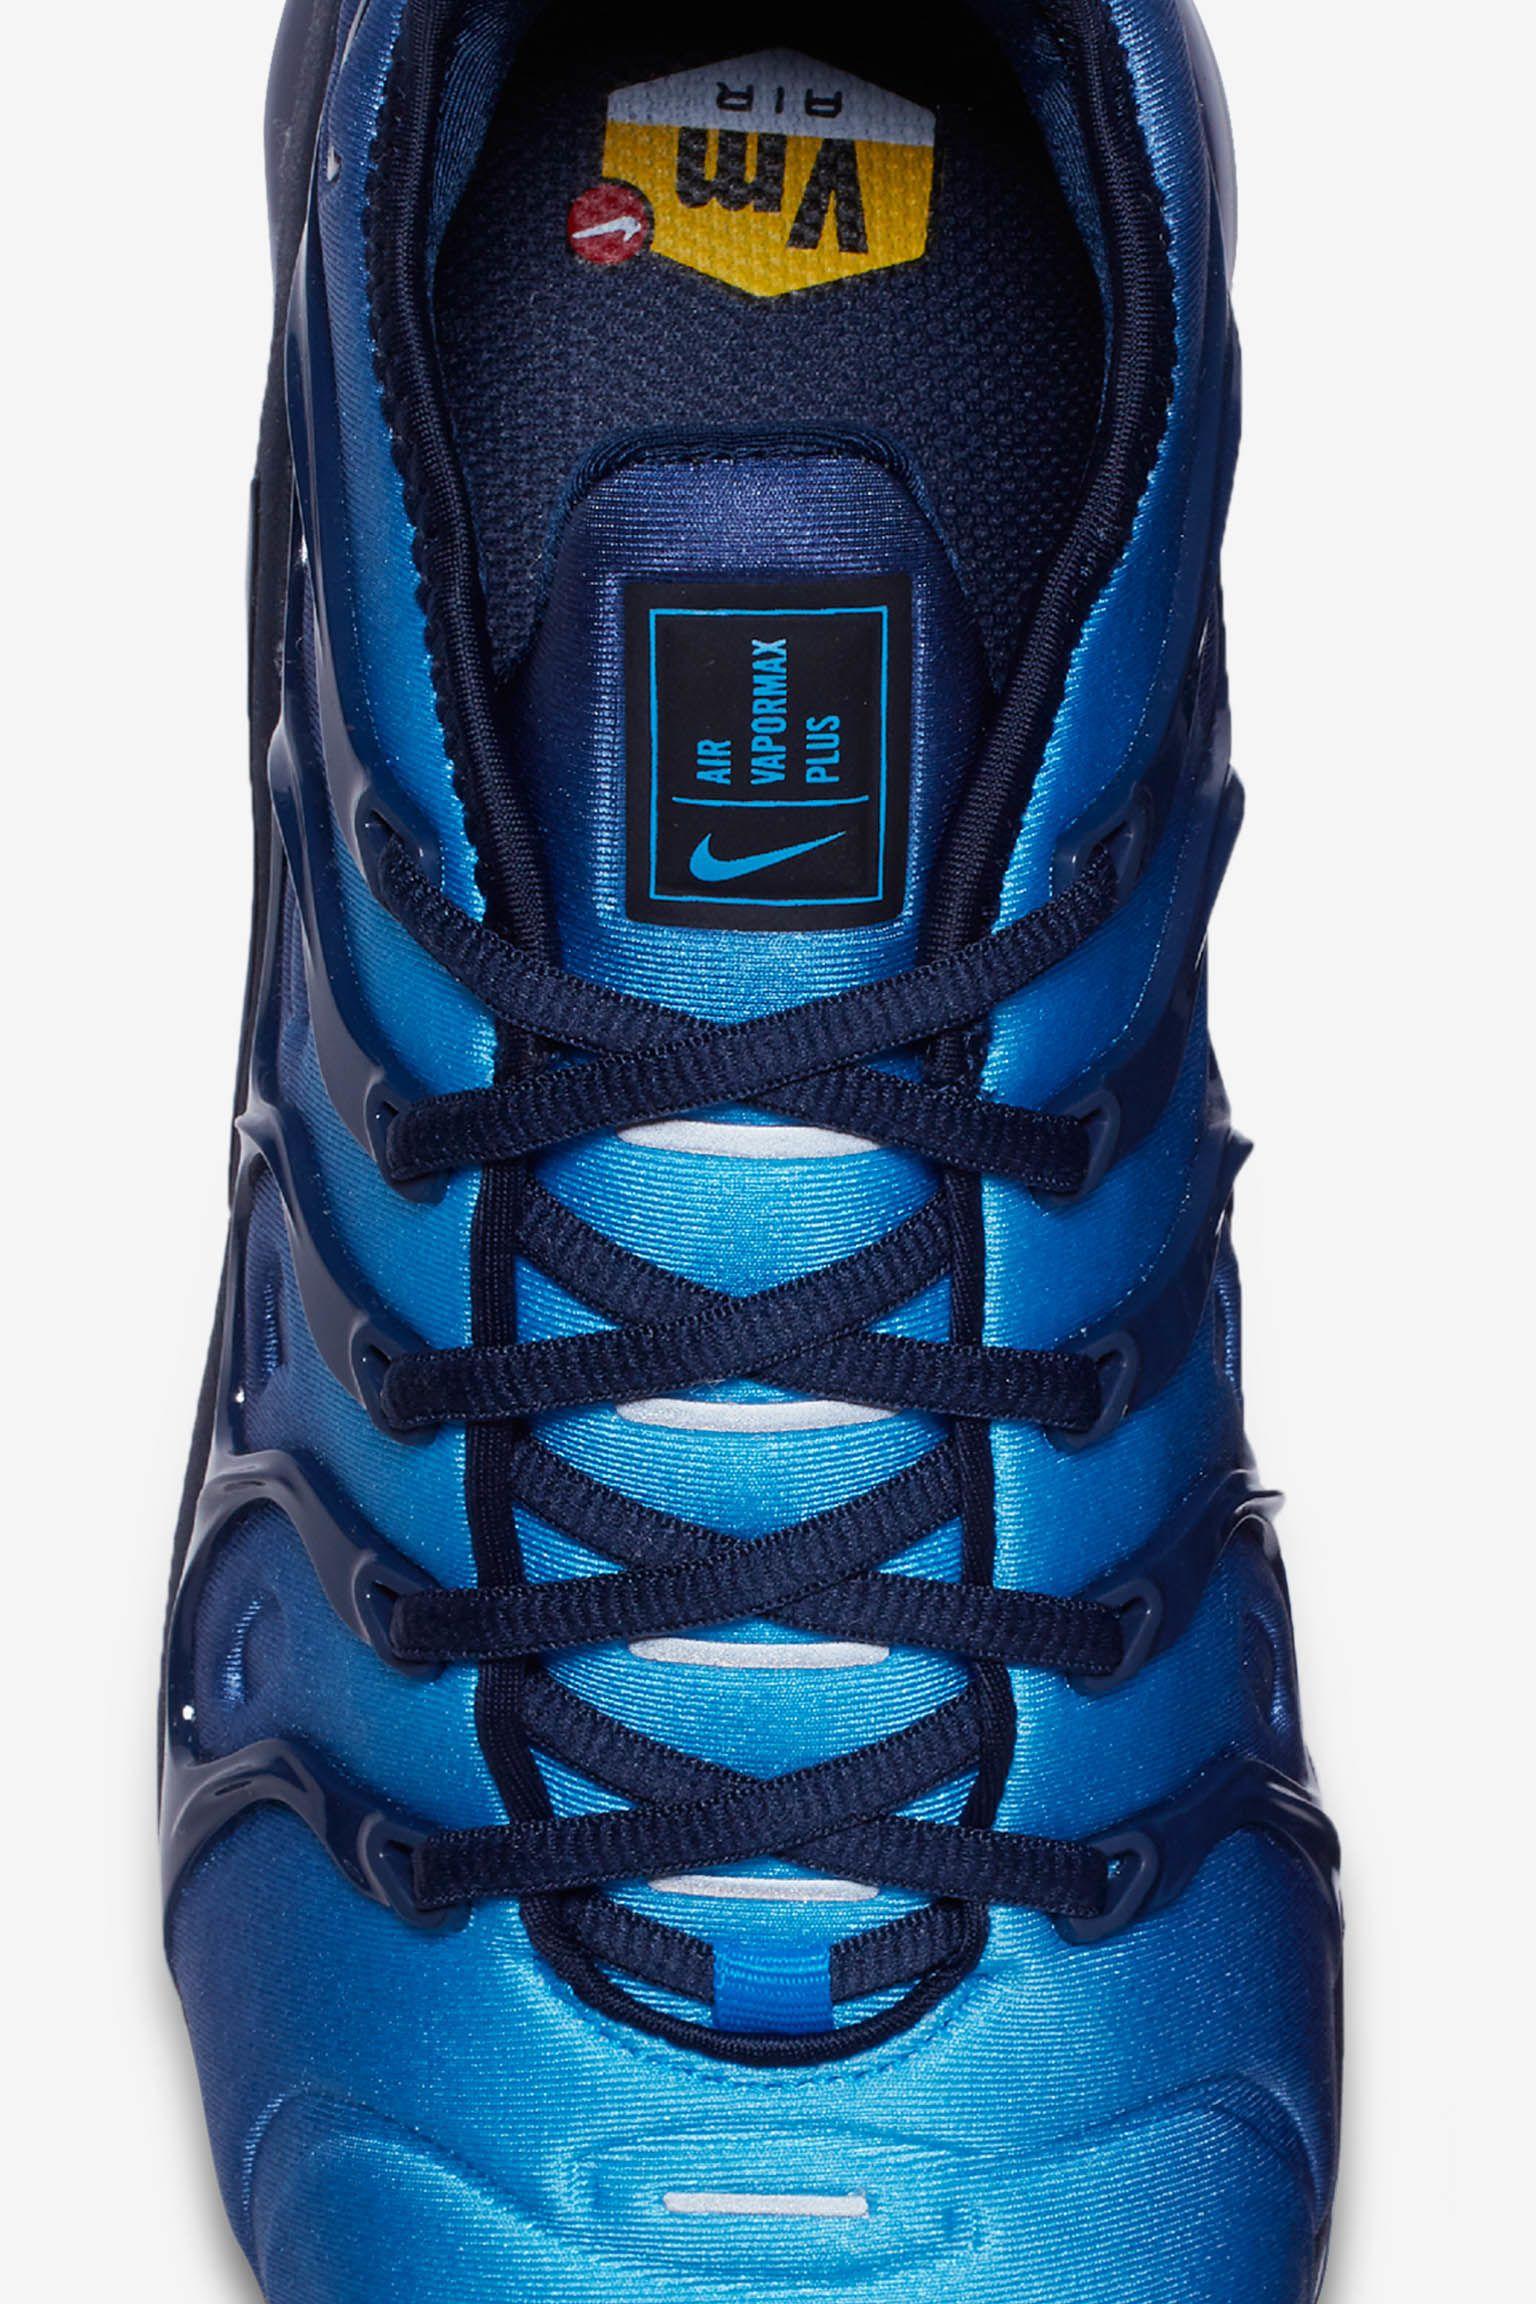 Nike Air VaporMax Plus 'Obsidian & Photo Blue' Release Date ...